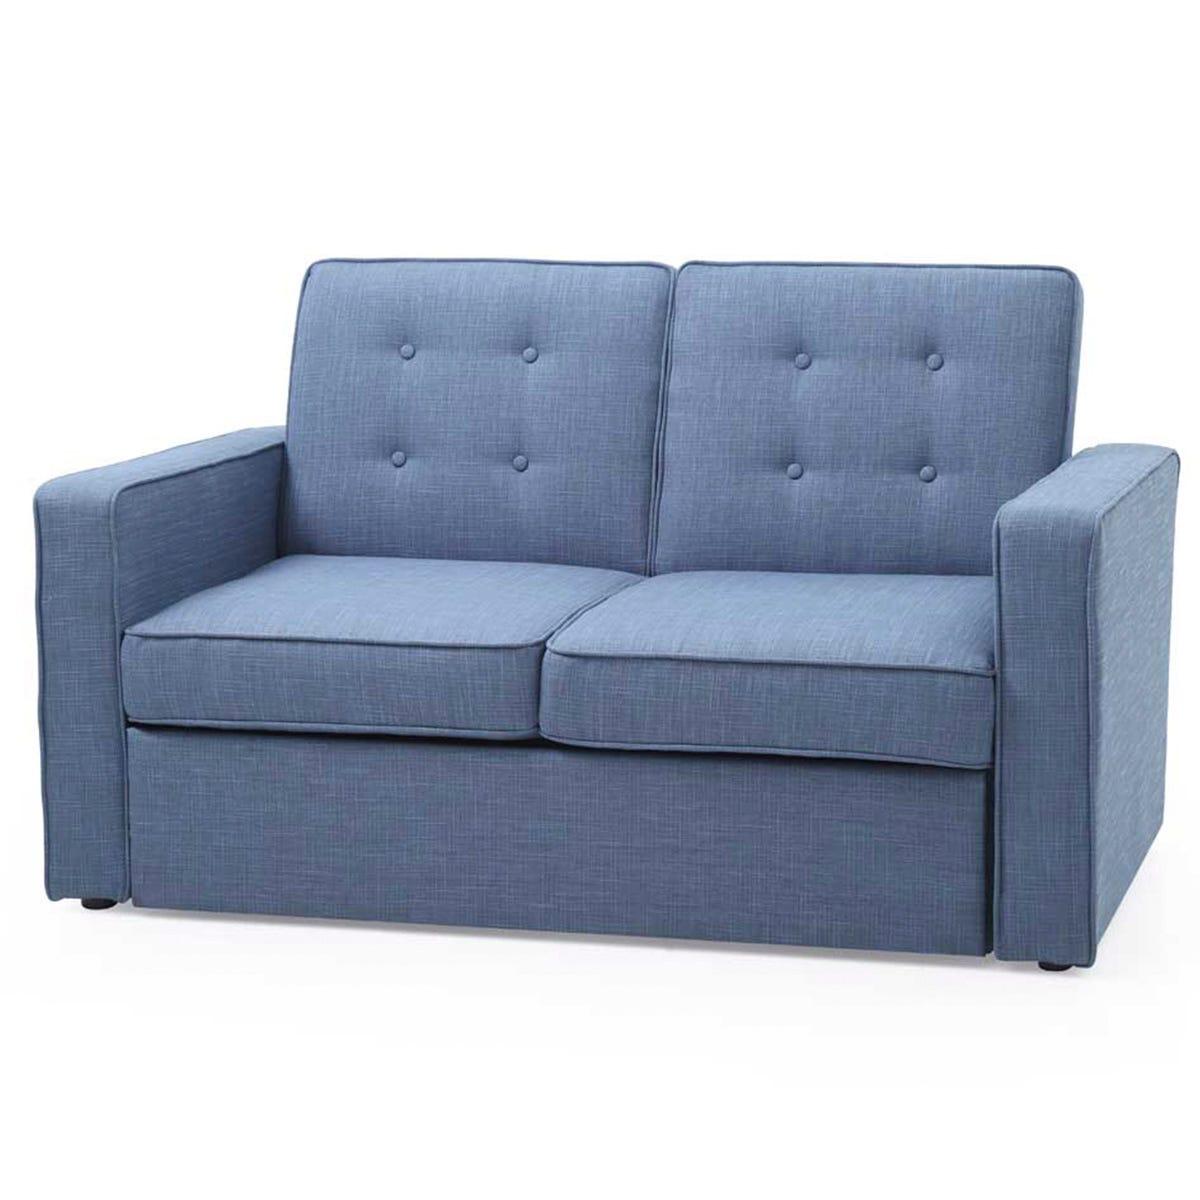 Jester 2 Seater Sofa Bed - Denim Blue